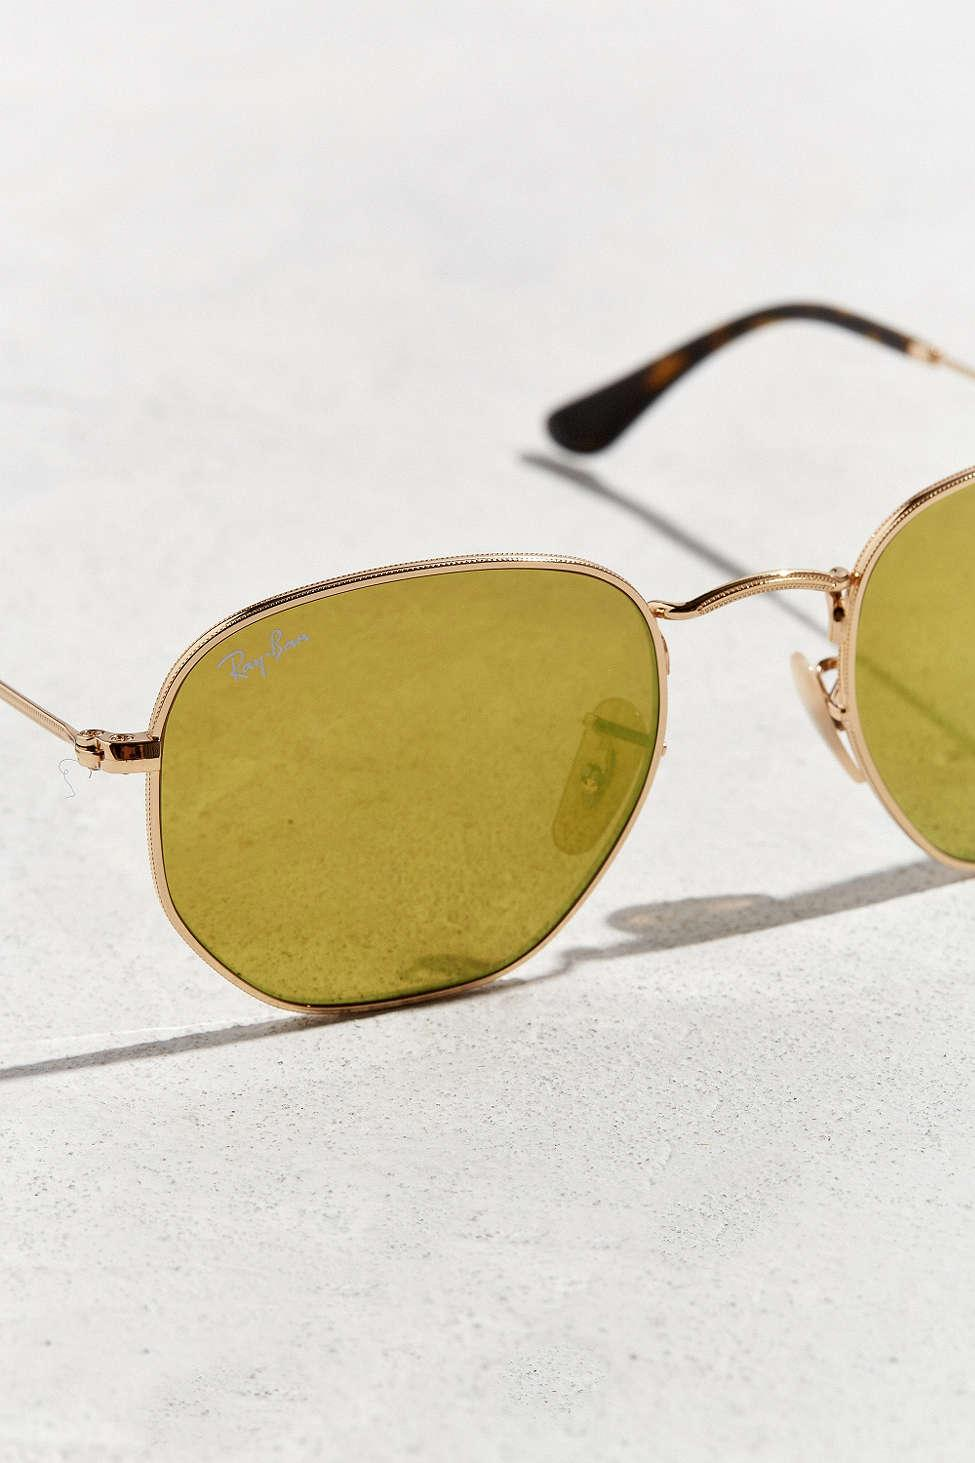 6947de492c Ray-ban Hexagonal Flat Lens Sunglasses